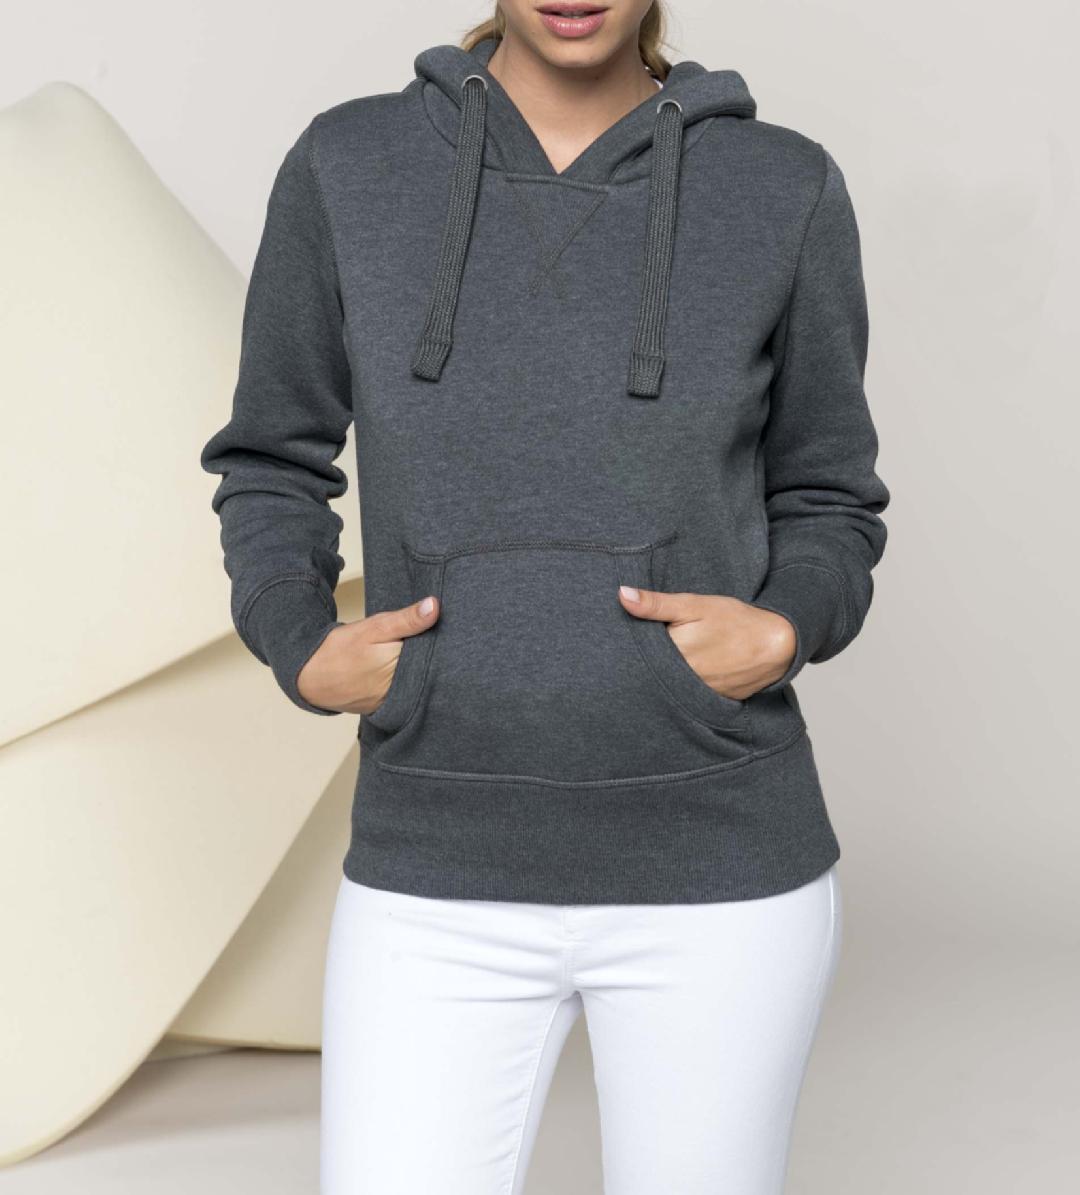 Sweatshirt de Senhora com capuz